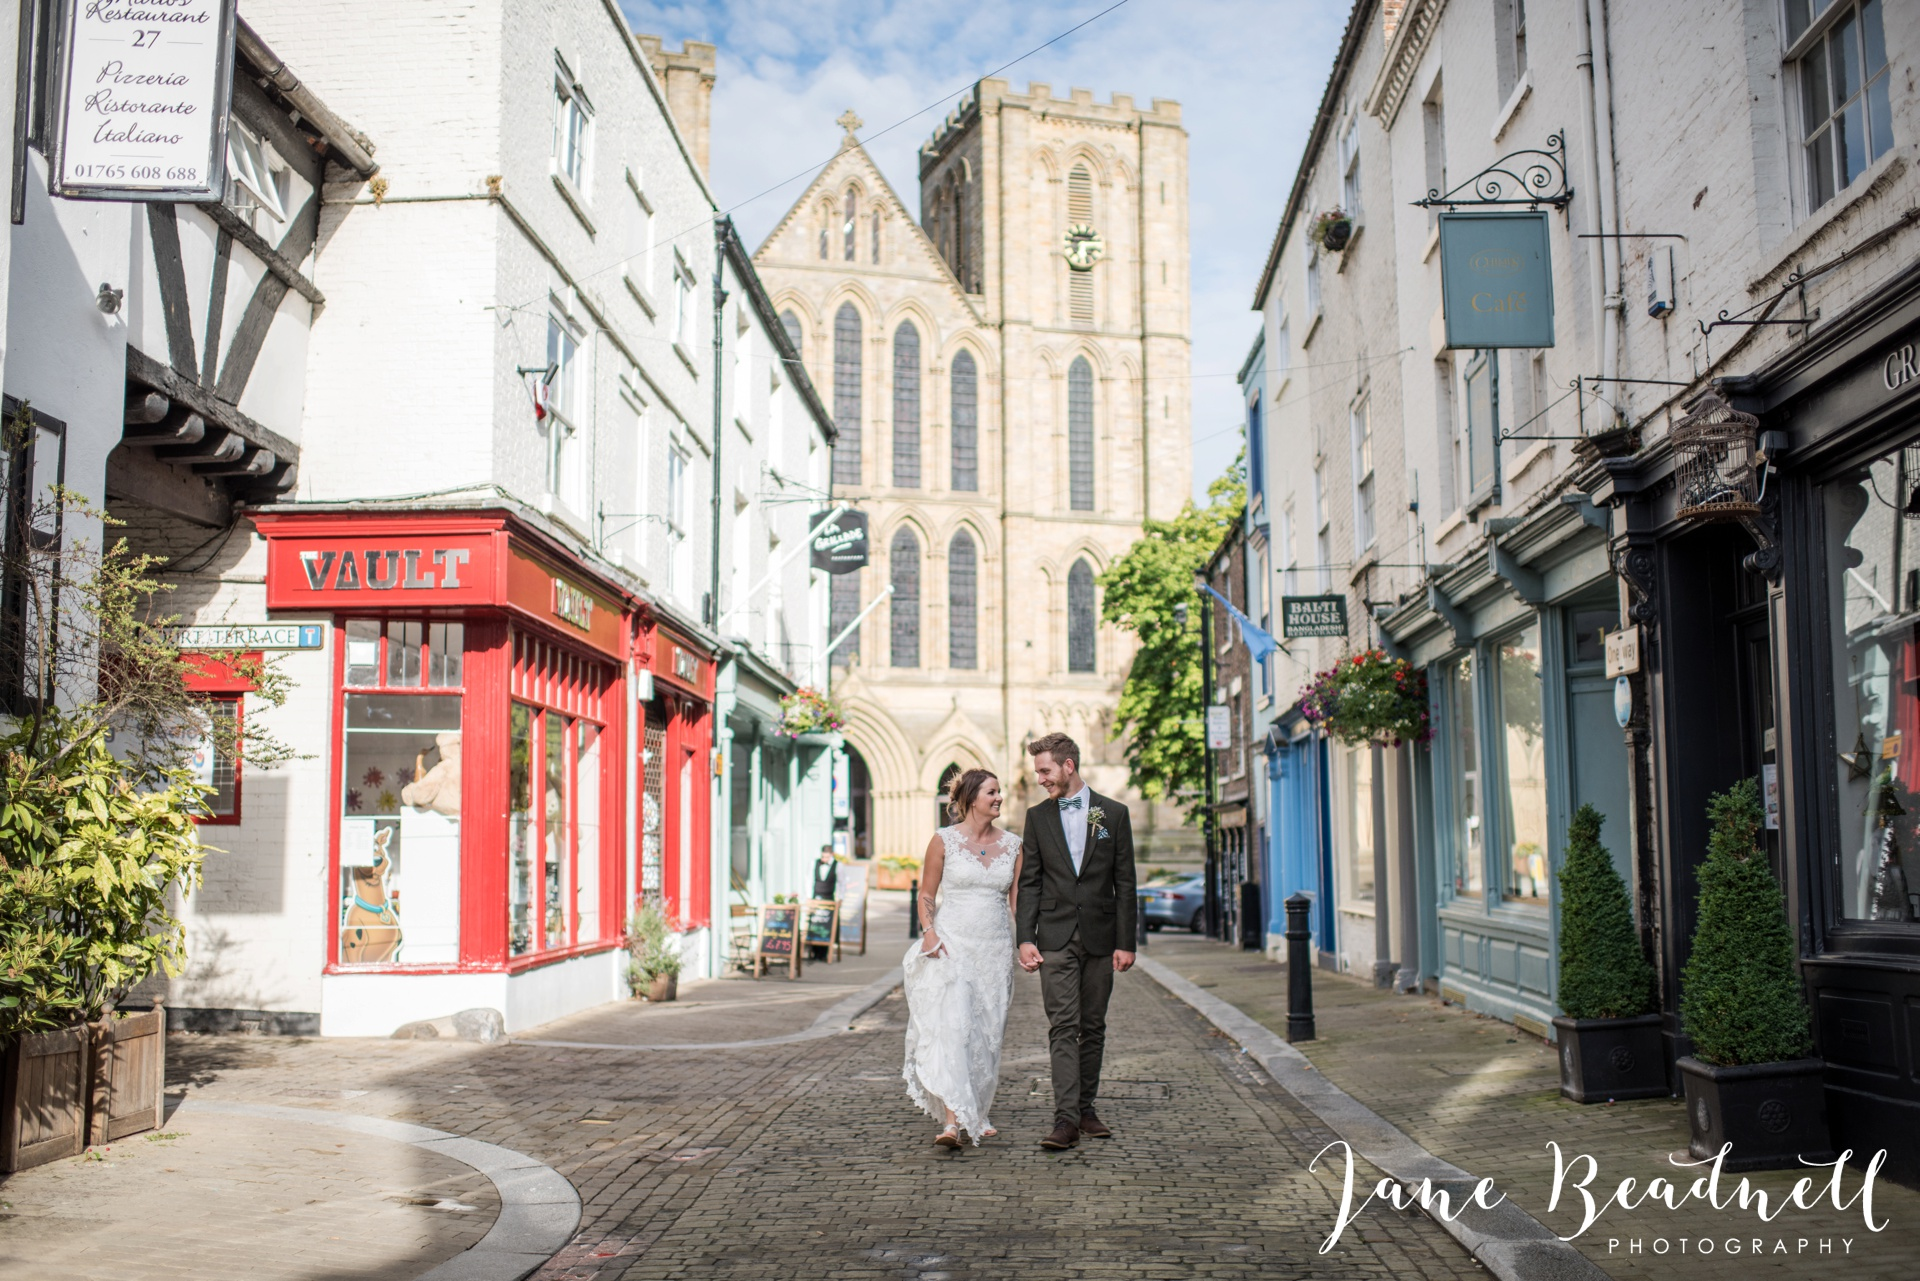 Jane Beadnell fine art wedding photographer The Old Deanery Ripon_0073